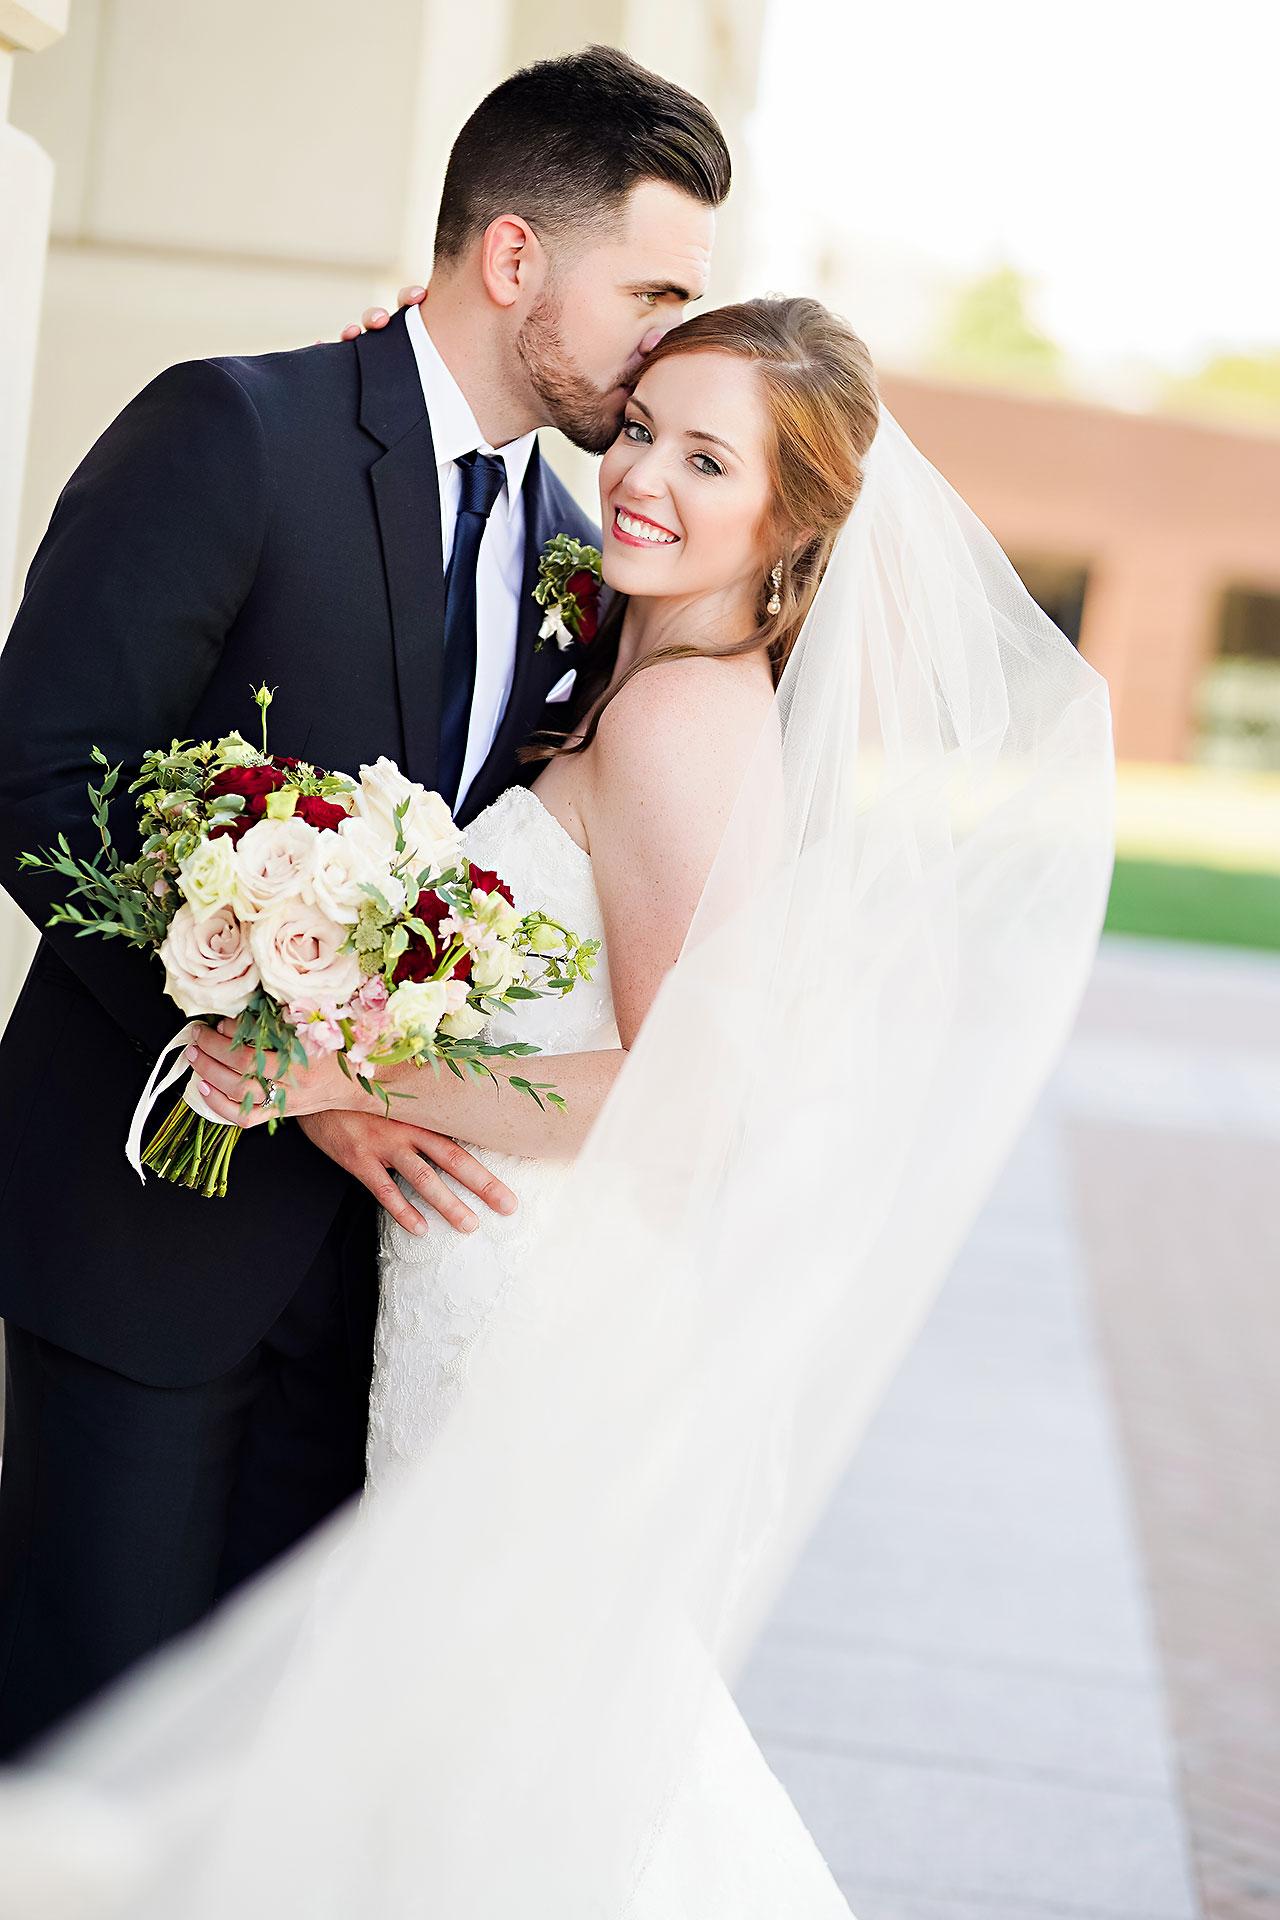 Callie Josh Ritz Charles Garden Pavilion Carmel Indiana Wedding 091